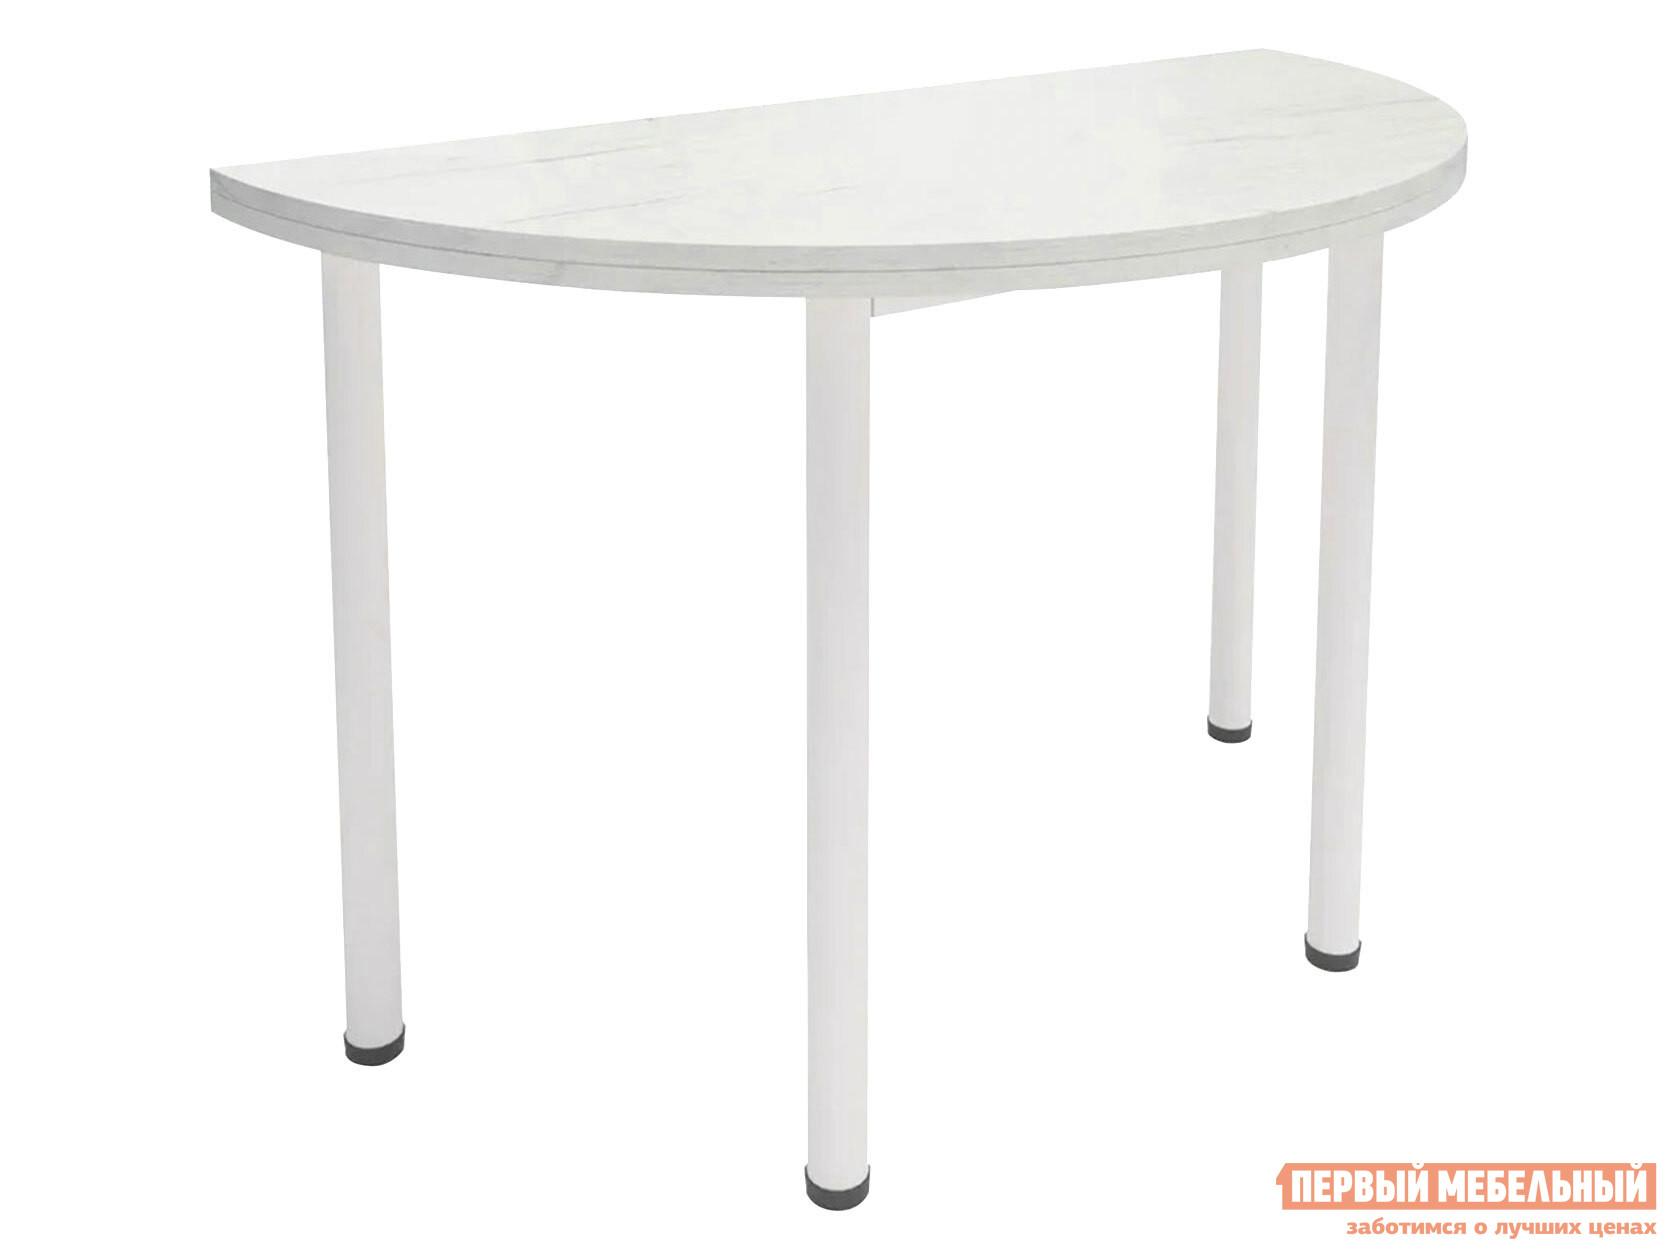 Кухонный стол  Стол-консоль Далис 1 Дуб Белый крафт / муар MillWood 123229